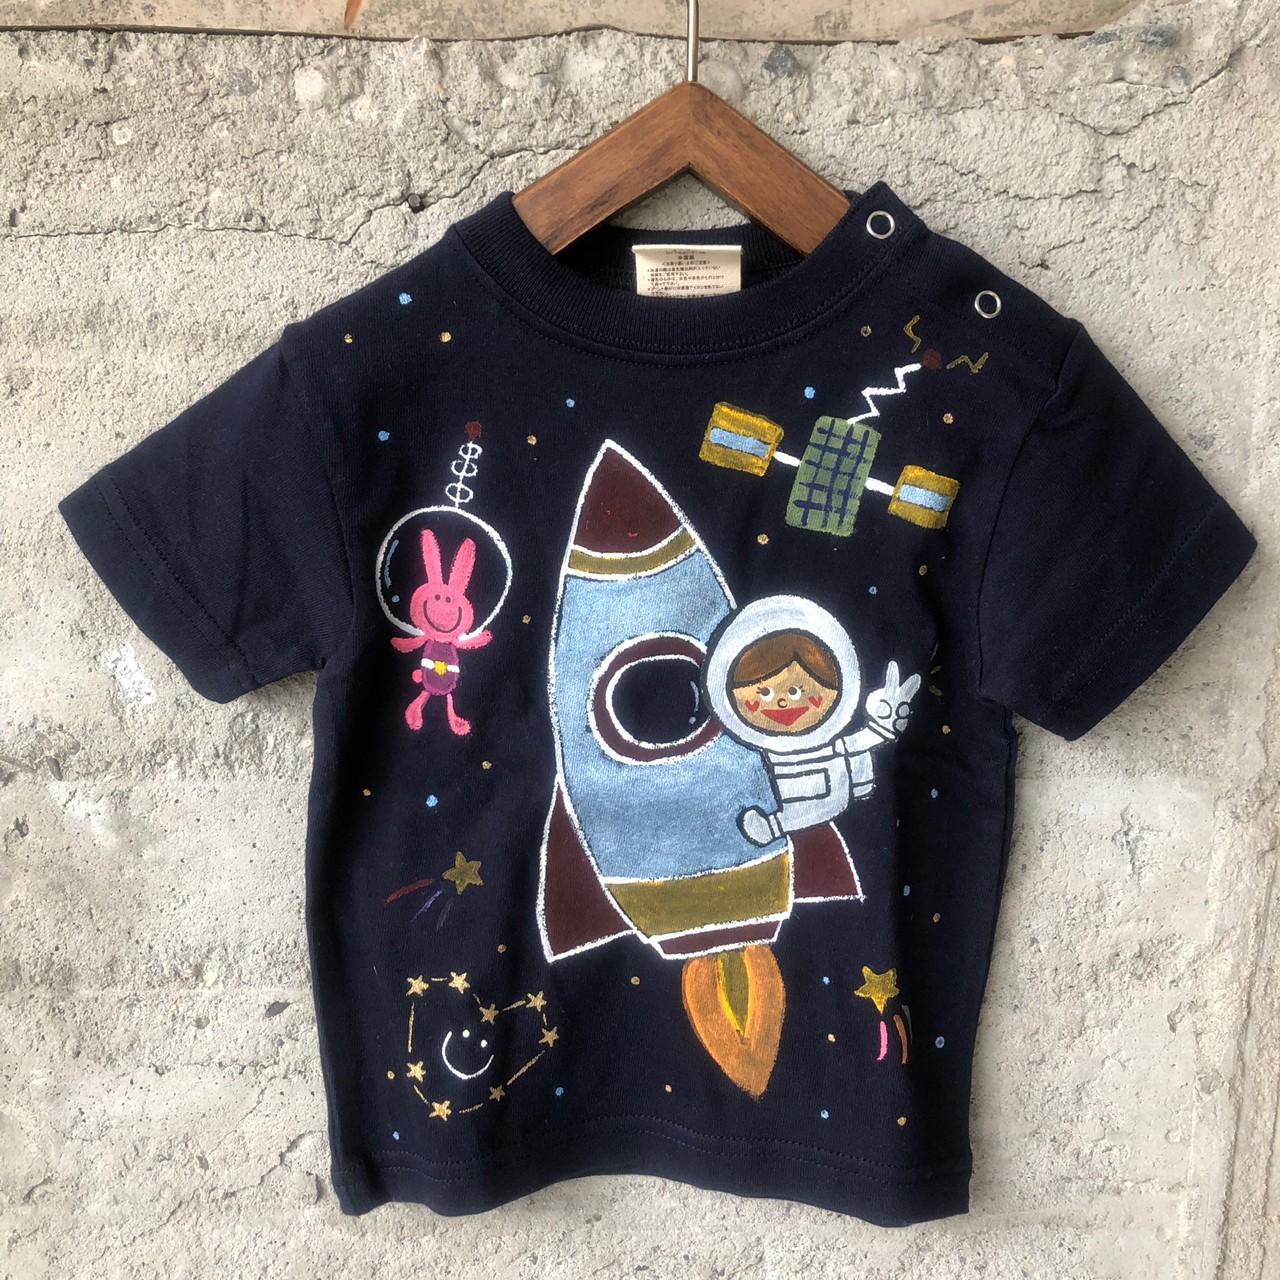 9a48ea58bf1ce セッションズ 名前入り 名入れTシャツ SESSIONS 手描きTシャツ 宇宙 ...